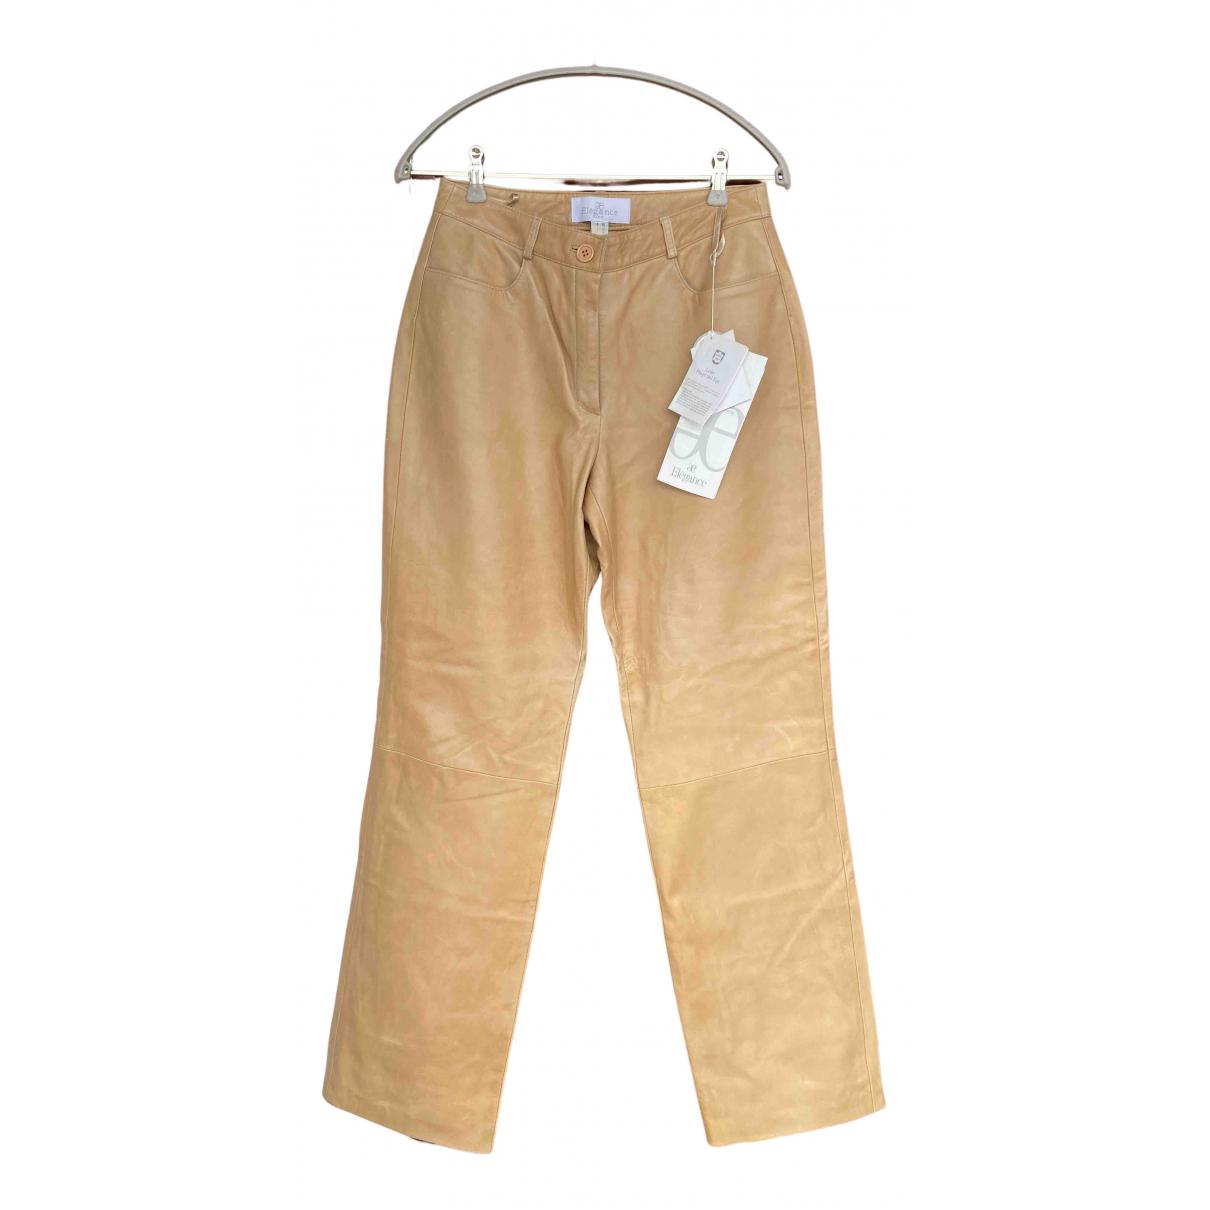 Elegance Paris N Beige Leather Trousers for Women 40 FR